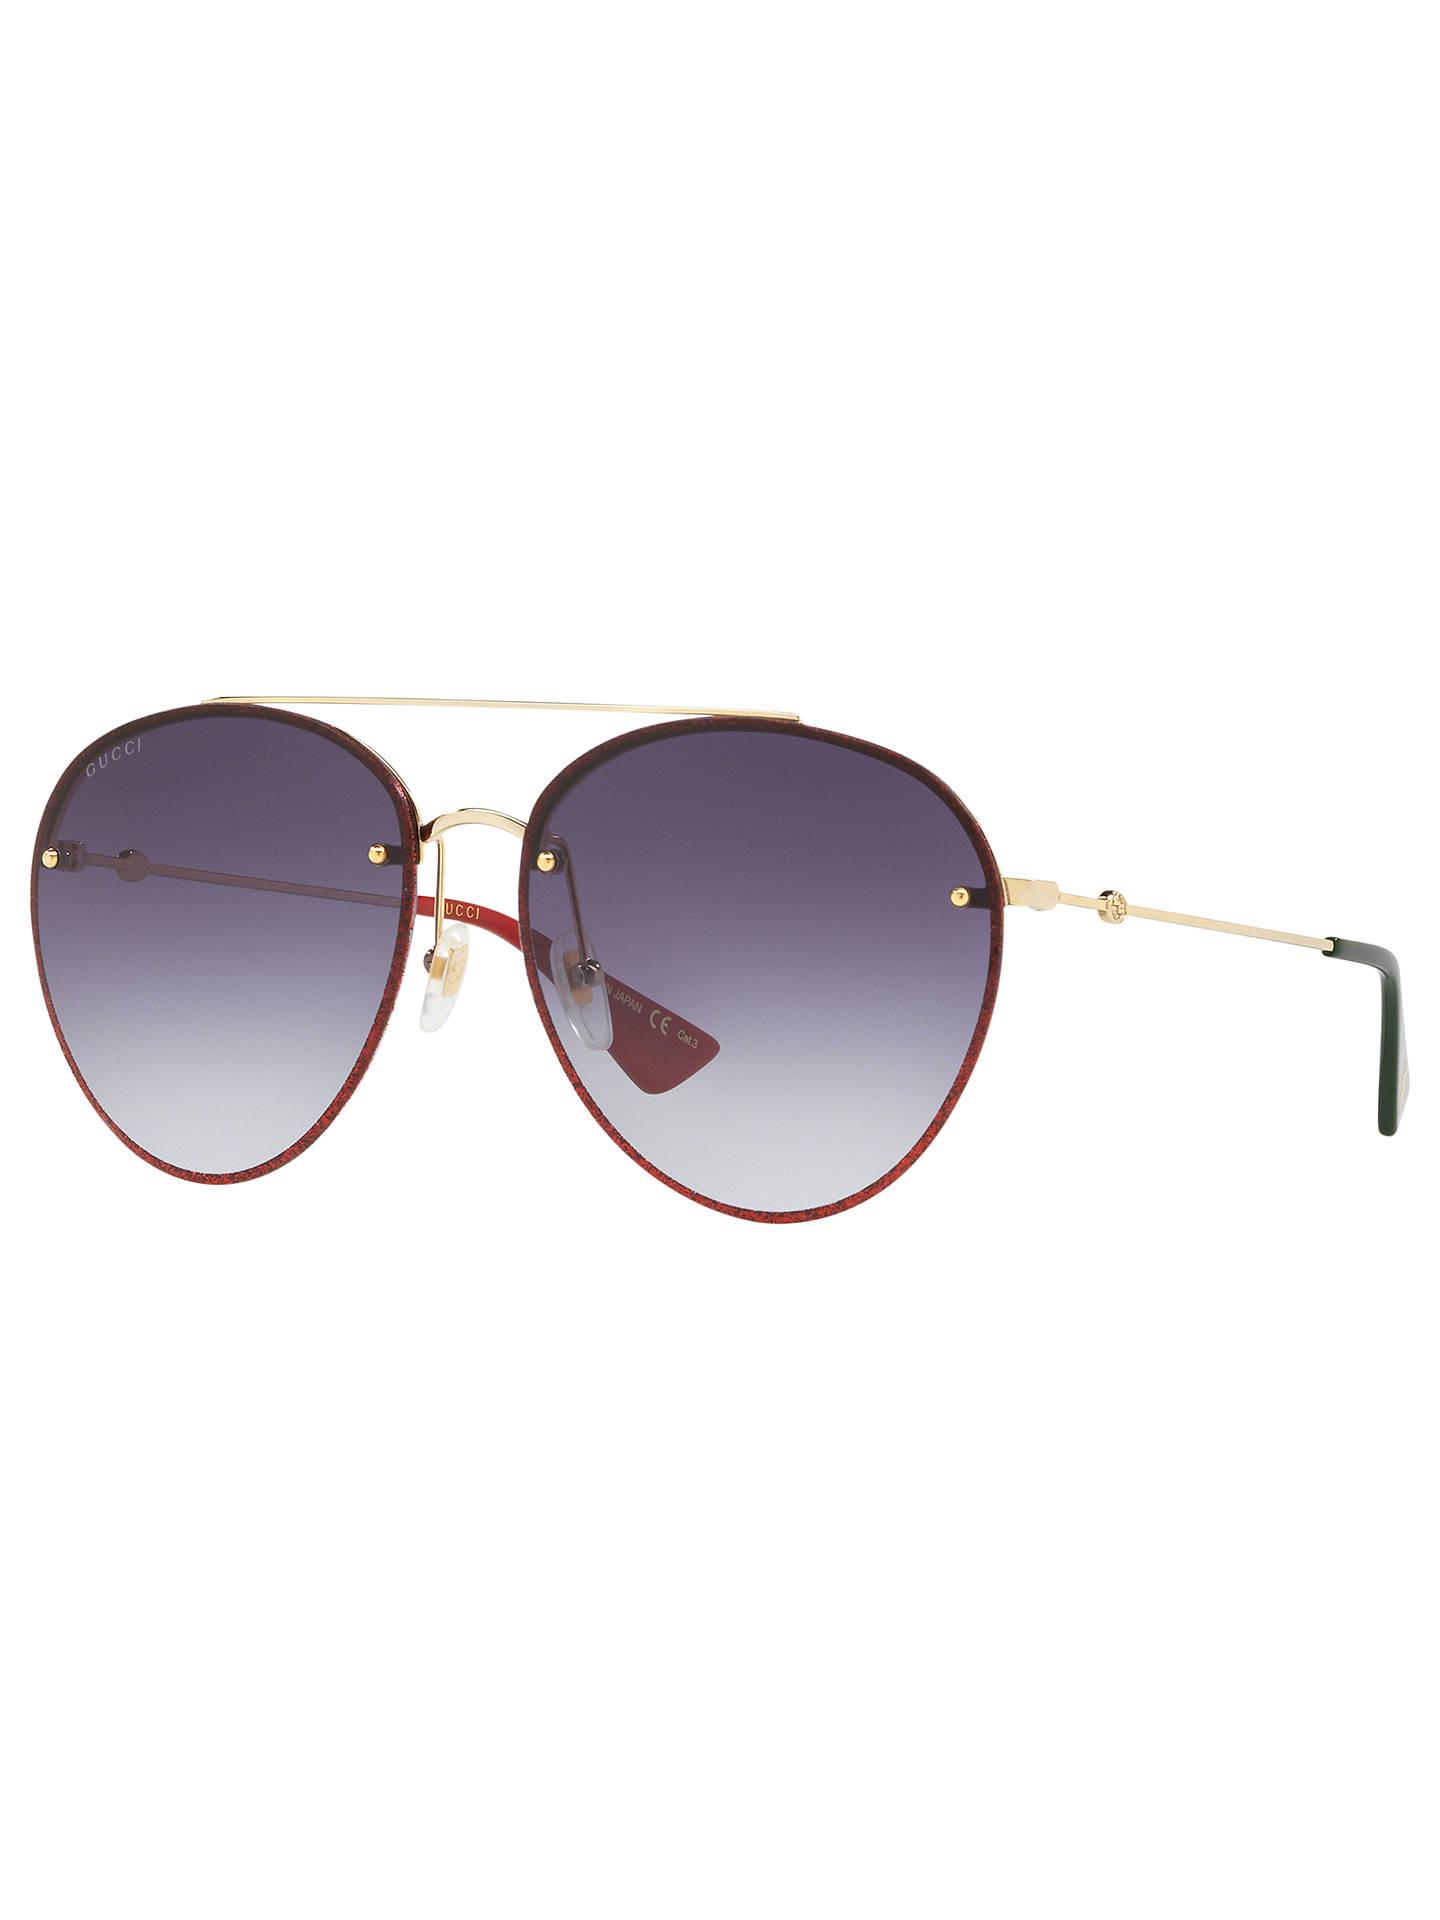 afaca194076 Gucci GG0351S Women s Aviator Sunglasses at John Lewis   Partners